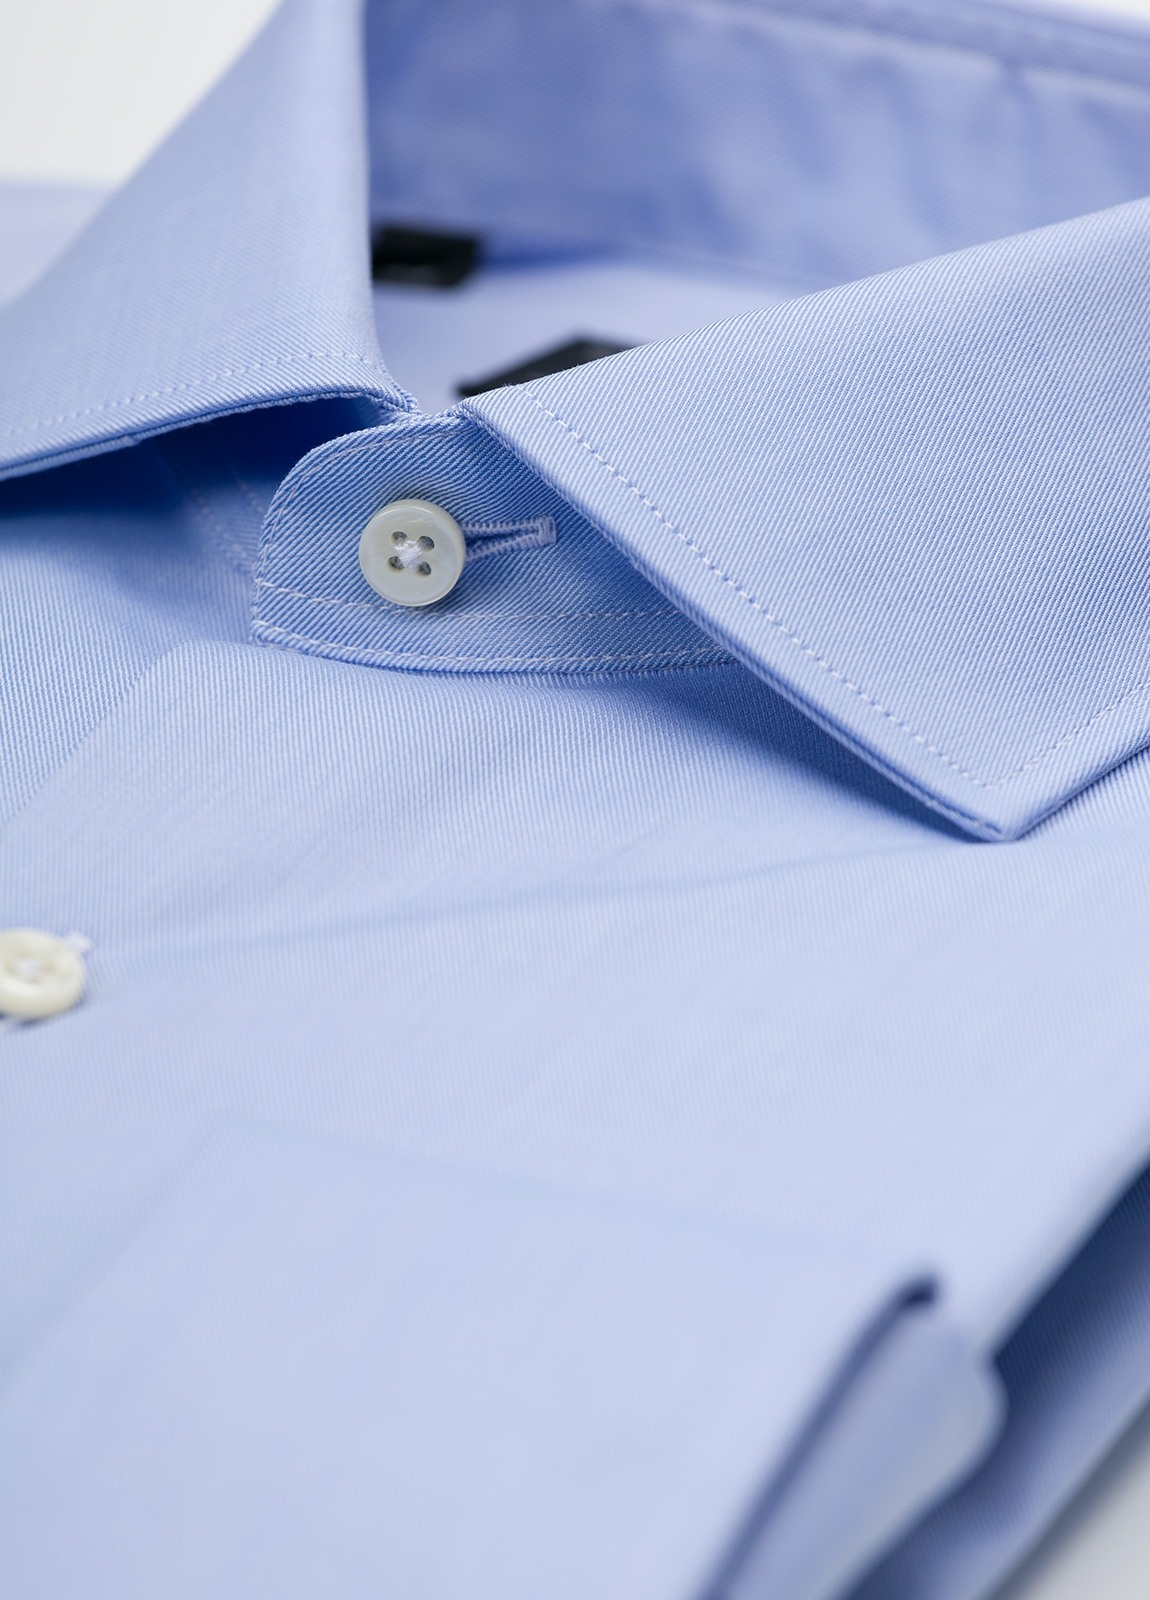 Camisa Formal Wear REGULAR FIT cuello italiano modelo TAILORED NAPOLI diseño liso color azul celeste. 100% Algodón. Fácil planchado. - Ítem1